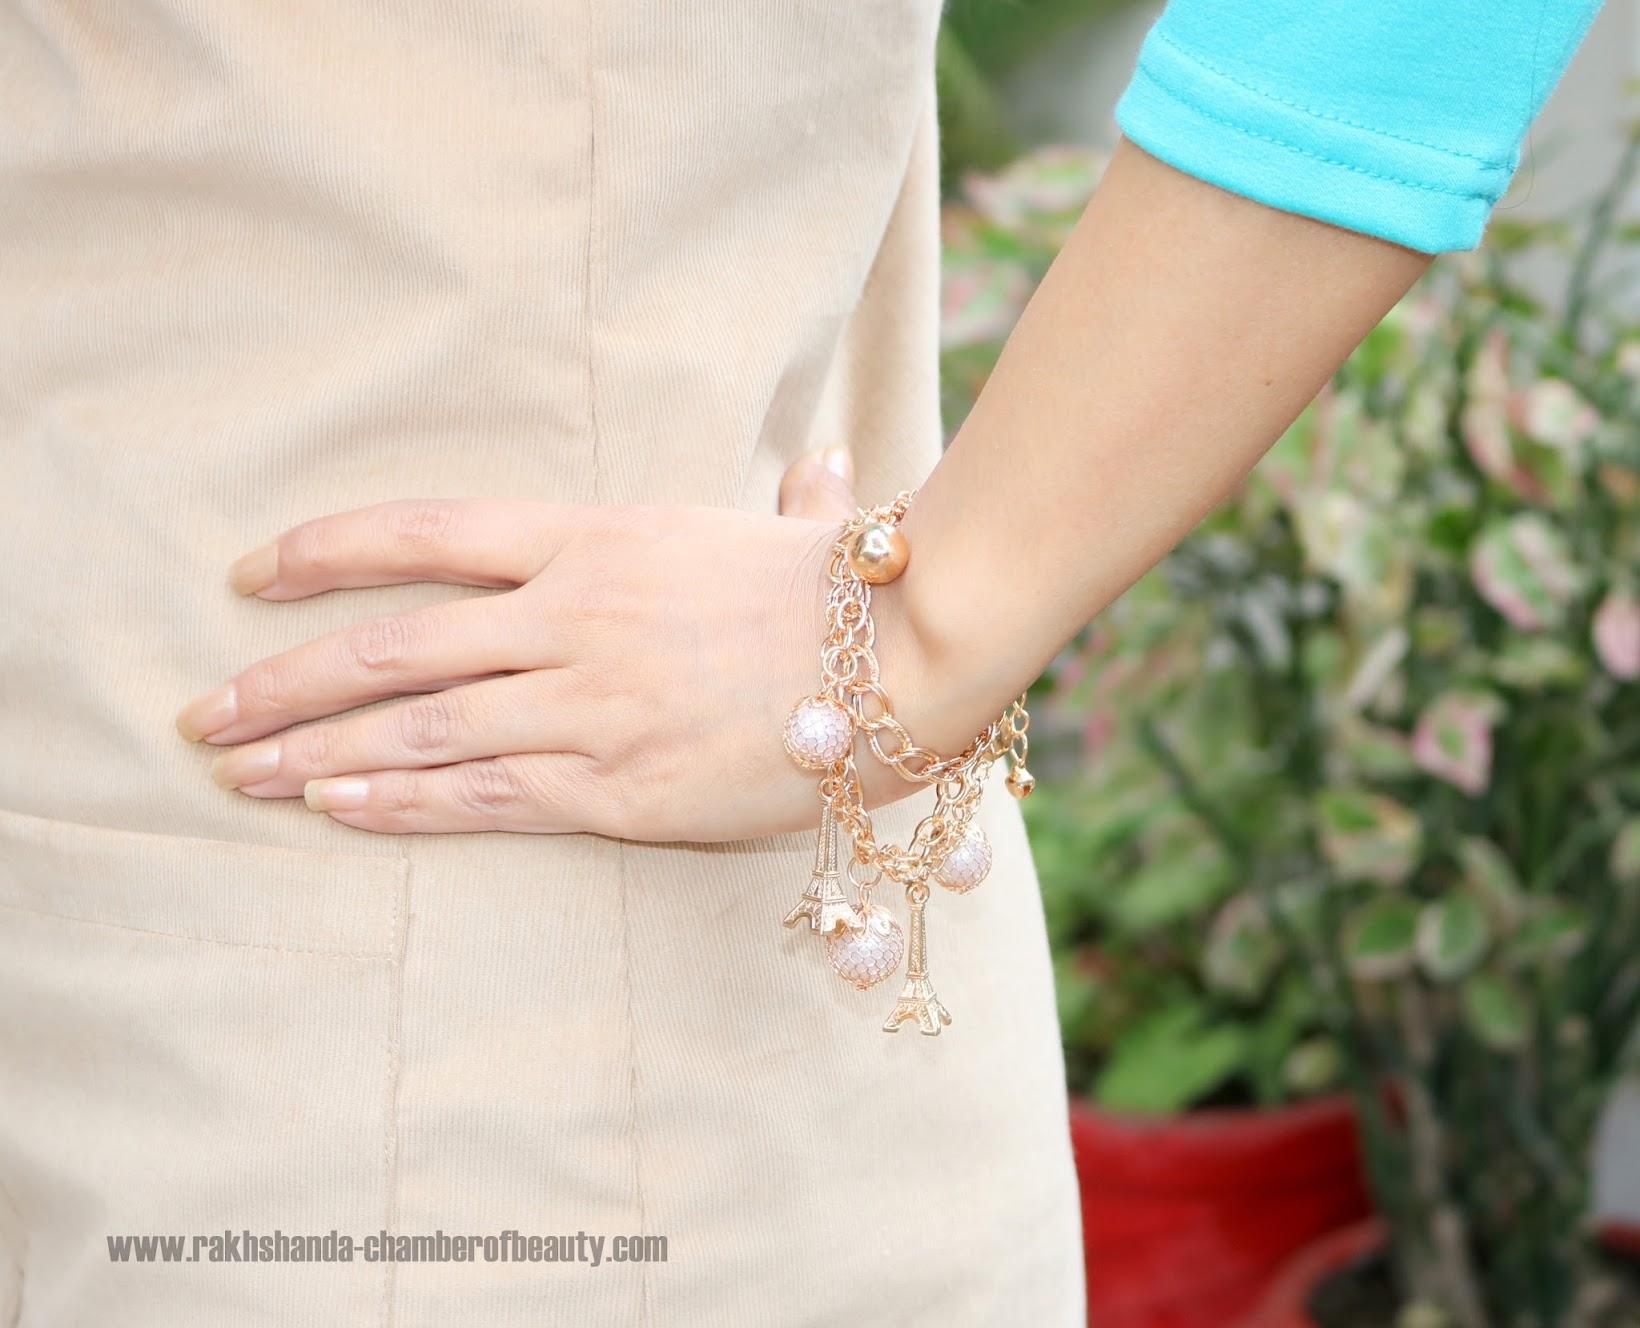 Goldtoned Charm bracelet Voylla.com, Jewelry shopping from Voylla.com, fashion jewelry online India